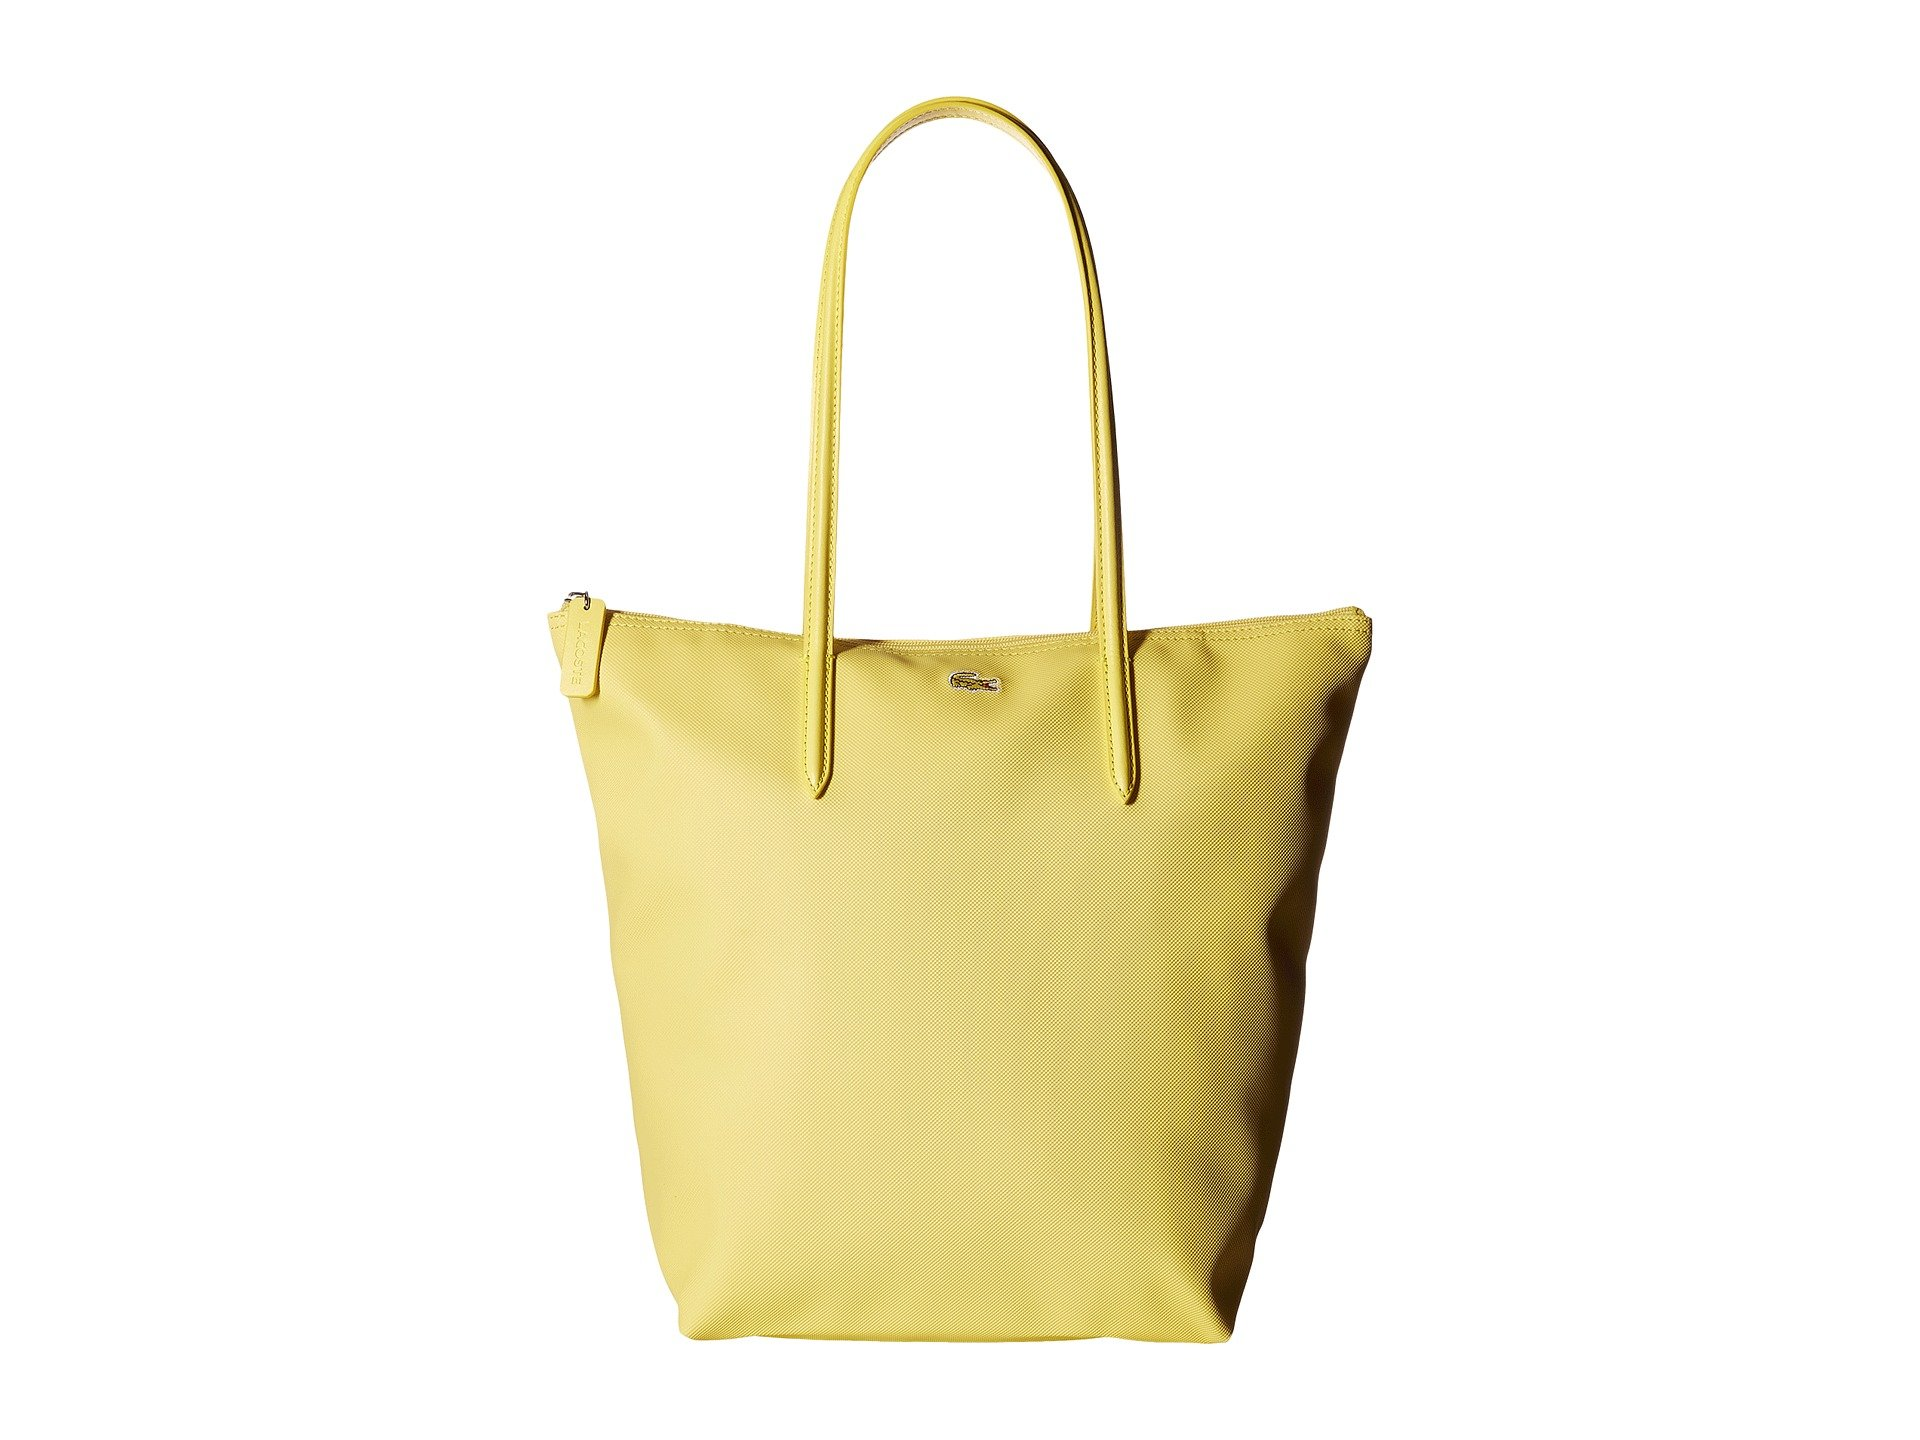 Bolso de Mano para Mujer Lacoste L.12.12 Concept Vertical Shopping Bag  + Lacoste en VeoyCompro.net